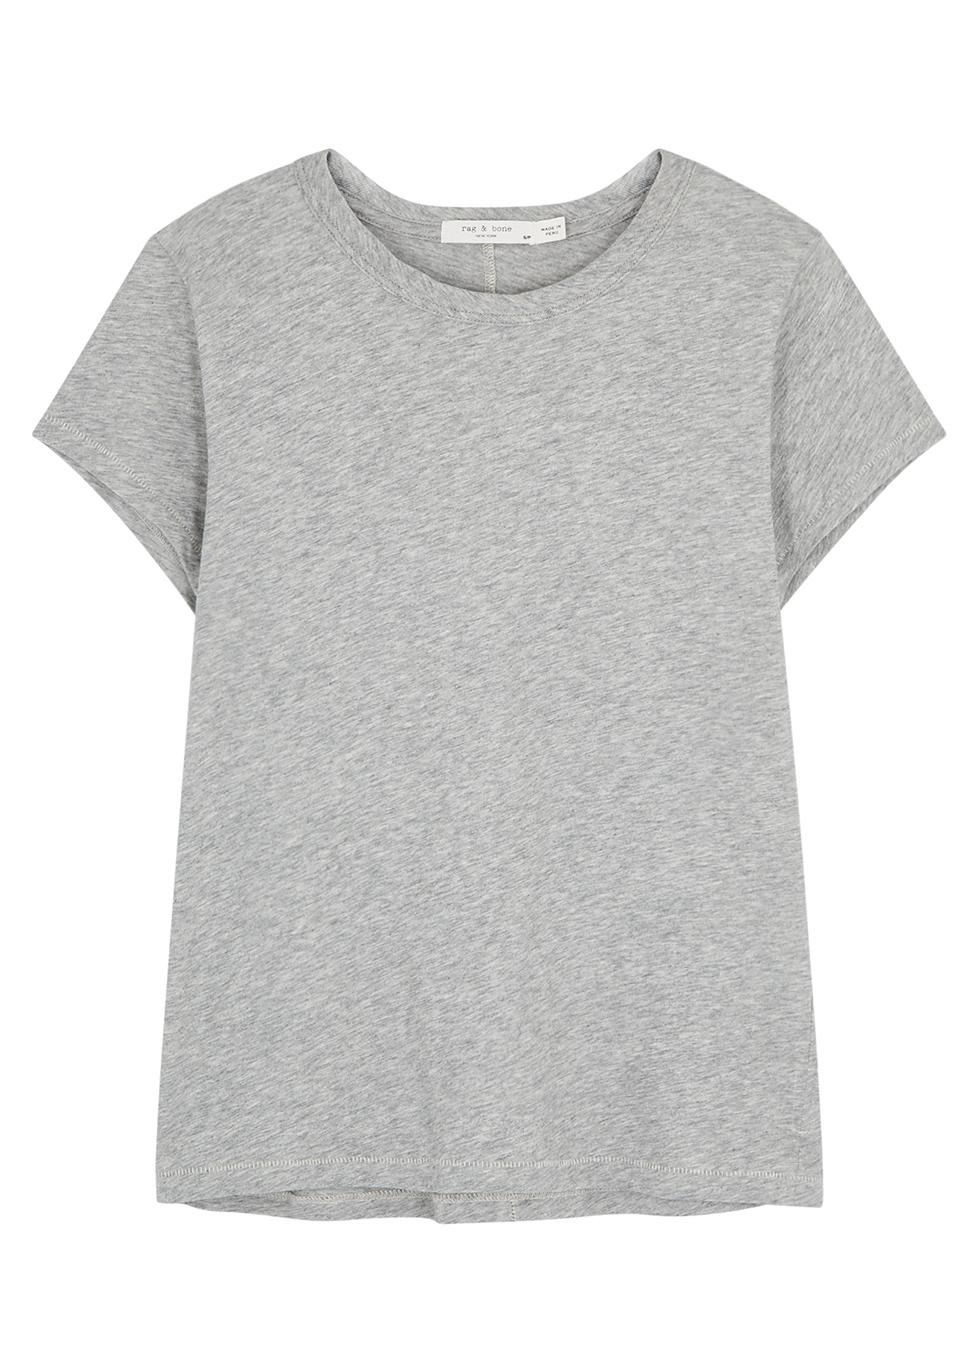 RAG & BONE | Rag & Bone The Tee Grey Cotton T-Shirt | Goxip